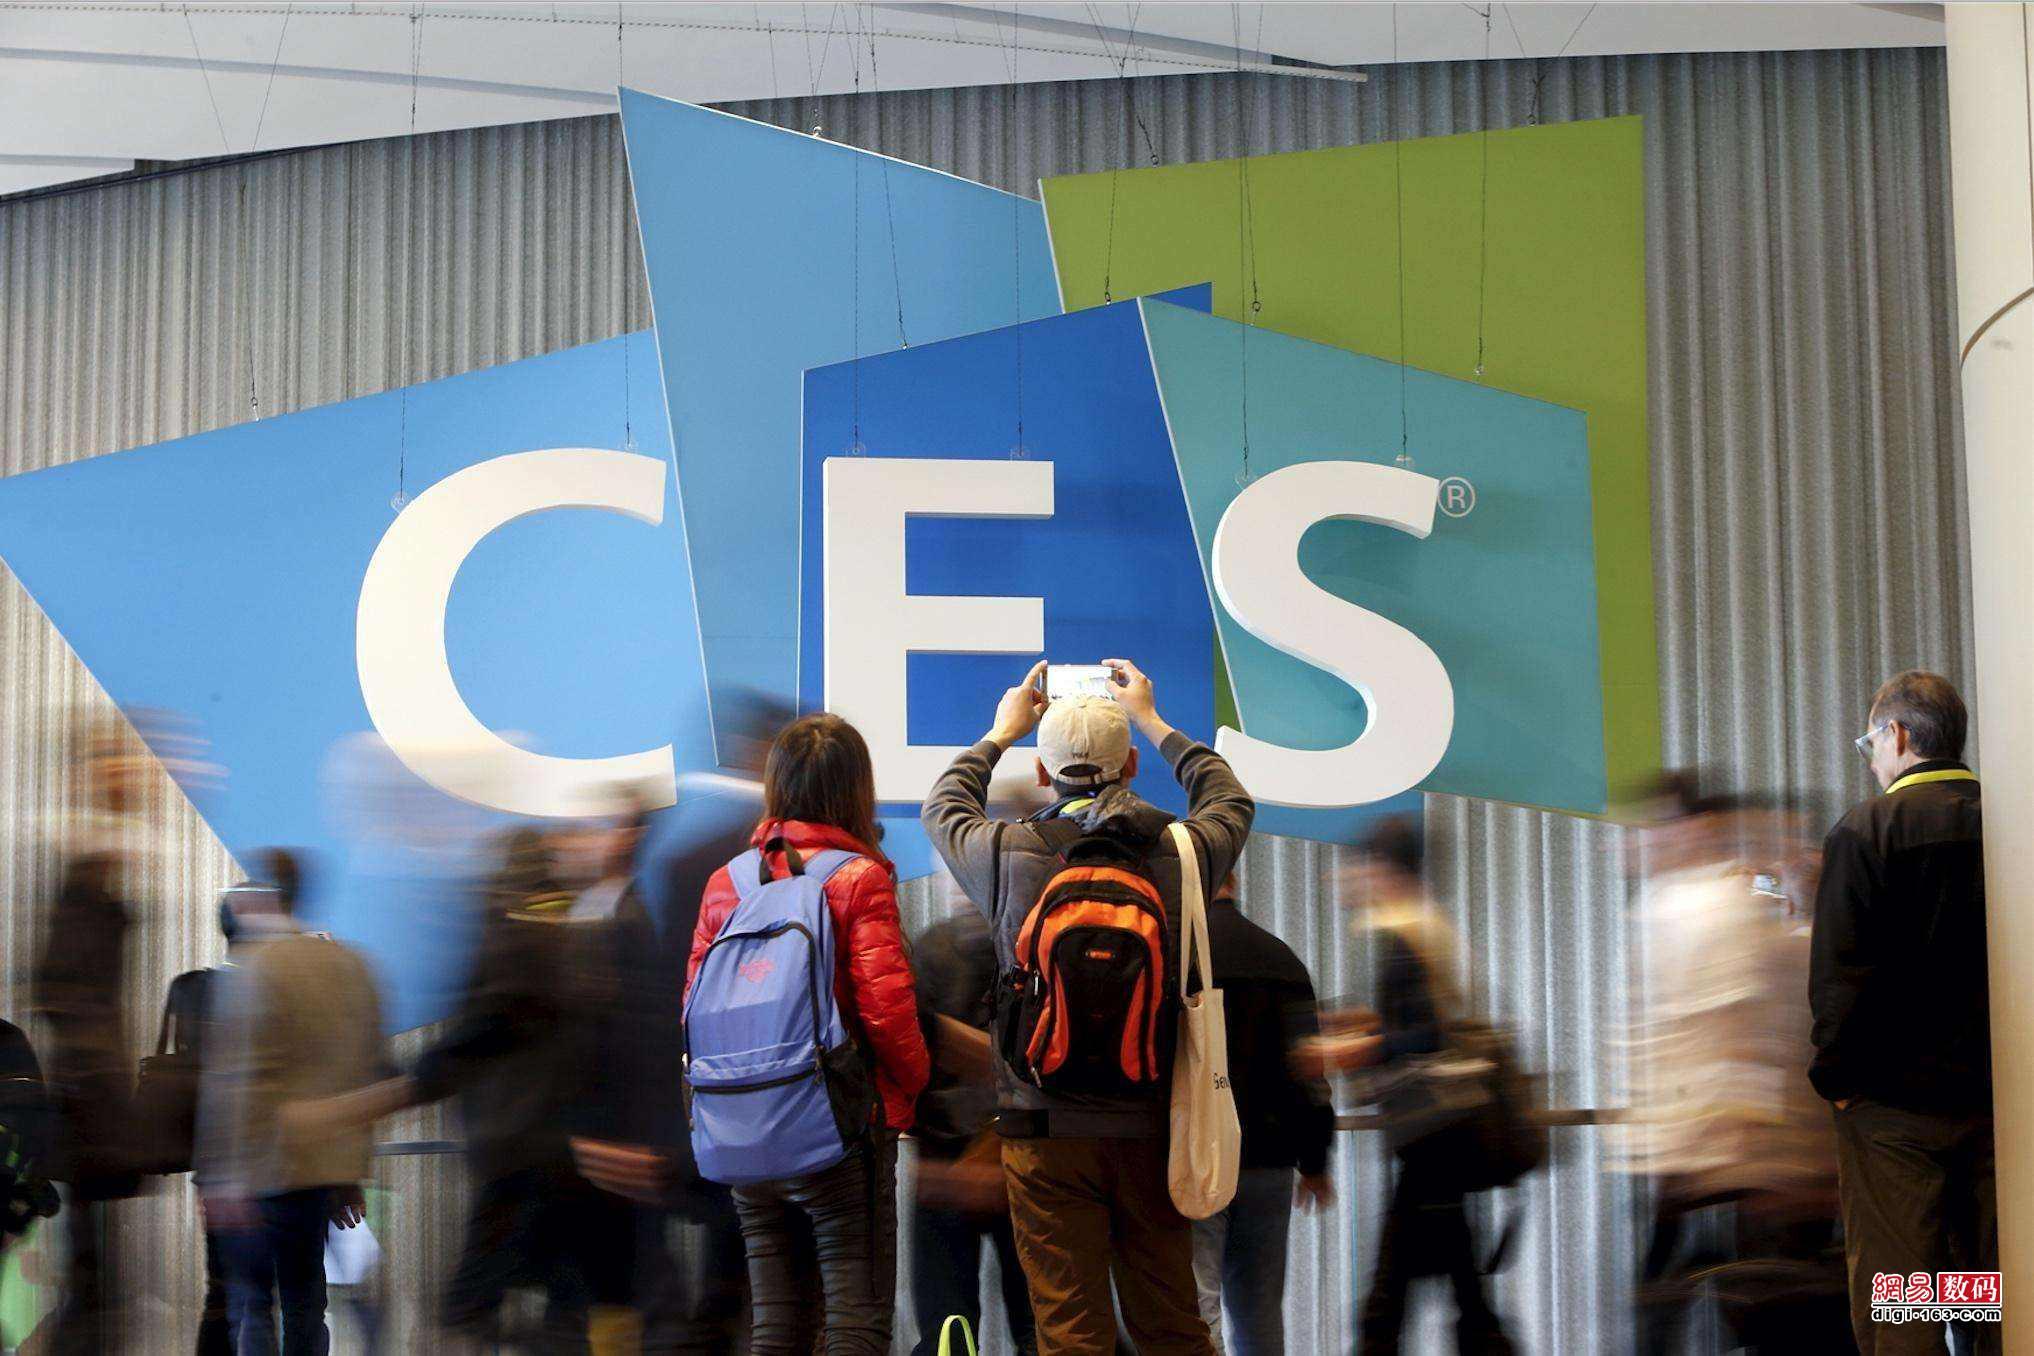 CES2018你肯定感兴趣的亮眼新品TOP10榜单